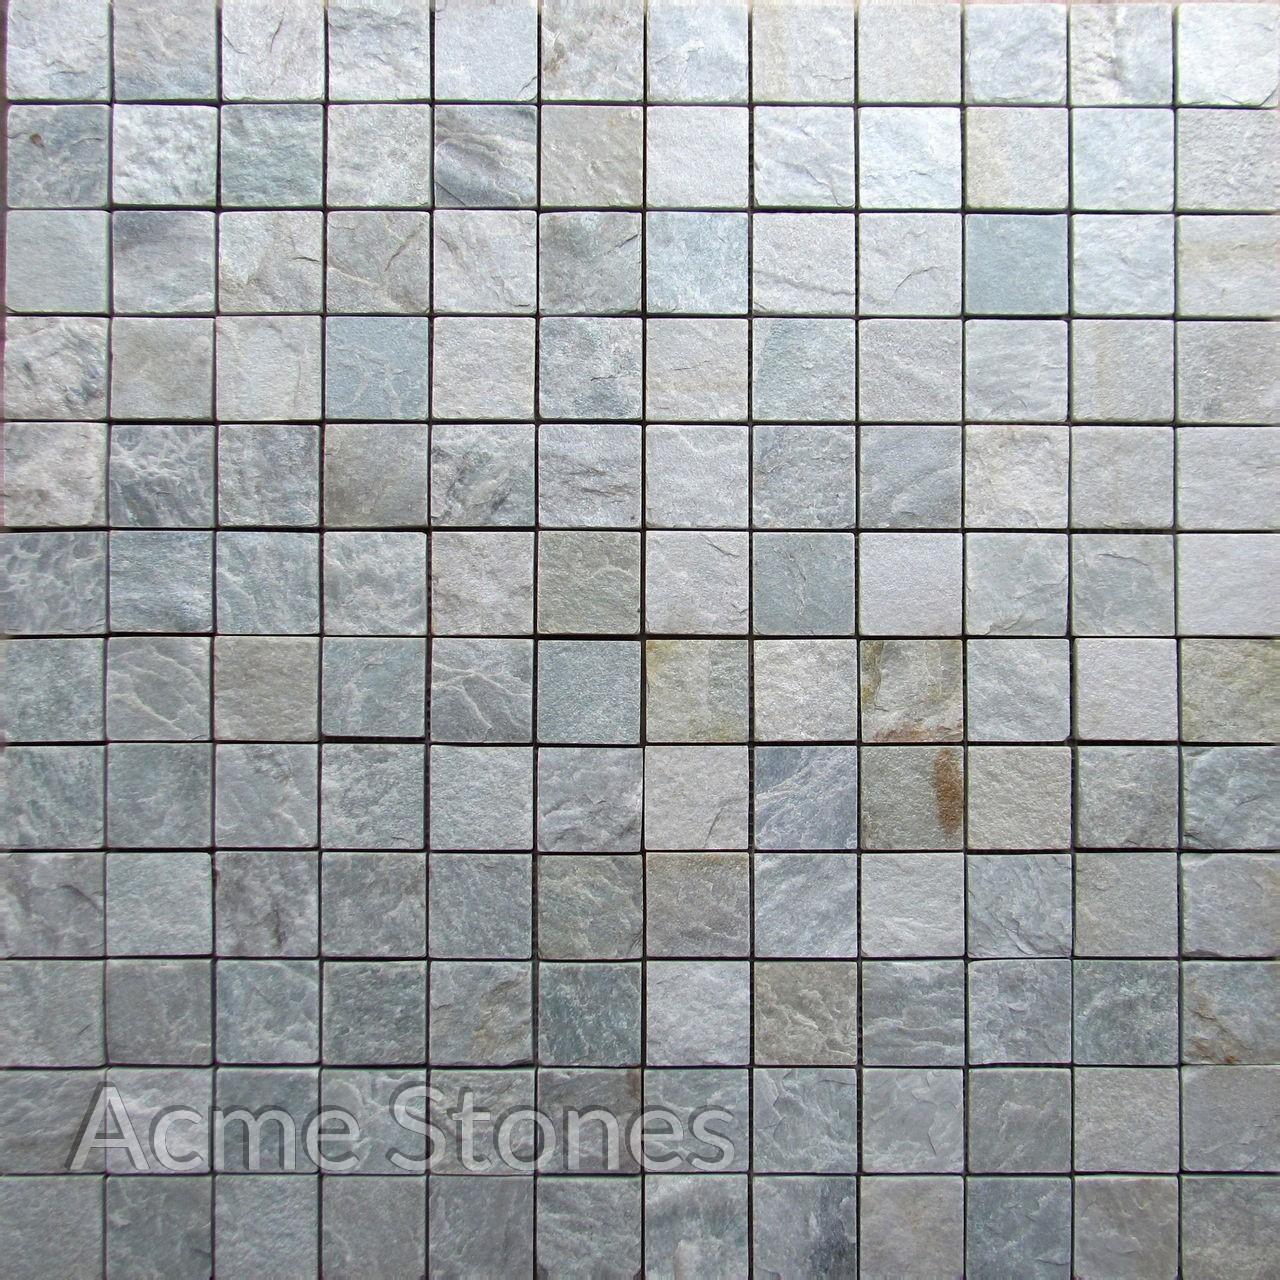 Regular Mosaic Himachal White 47x47mm